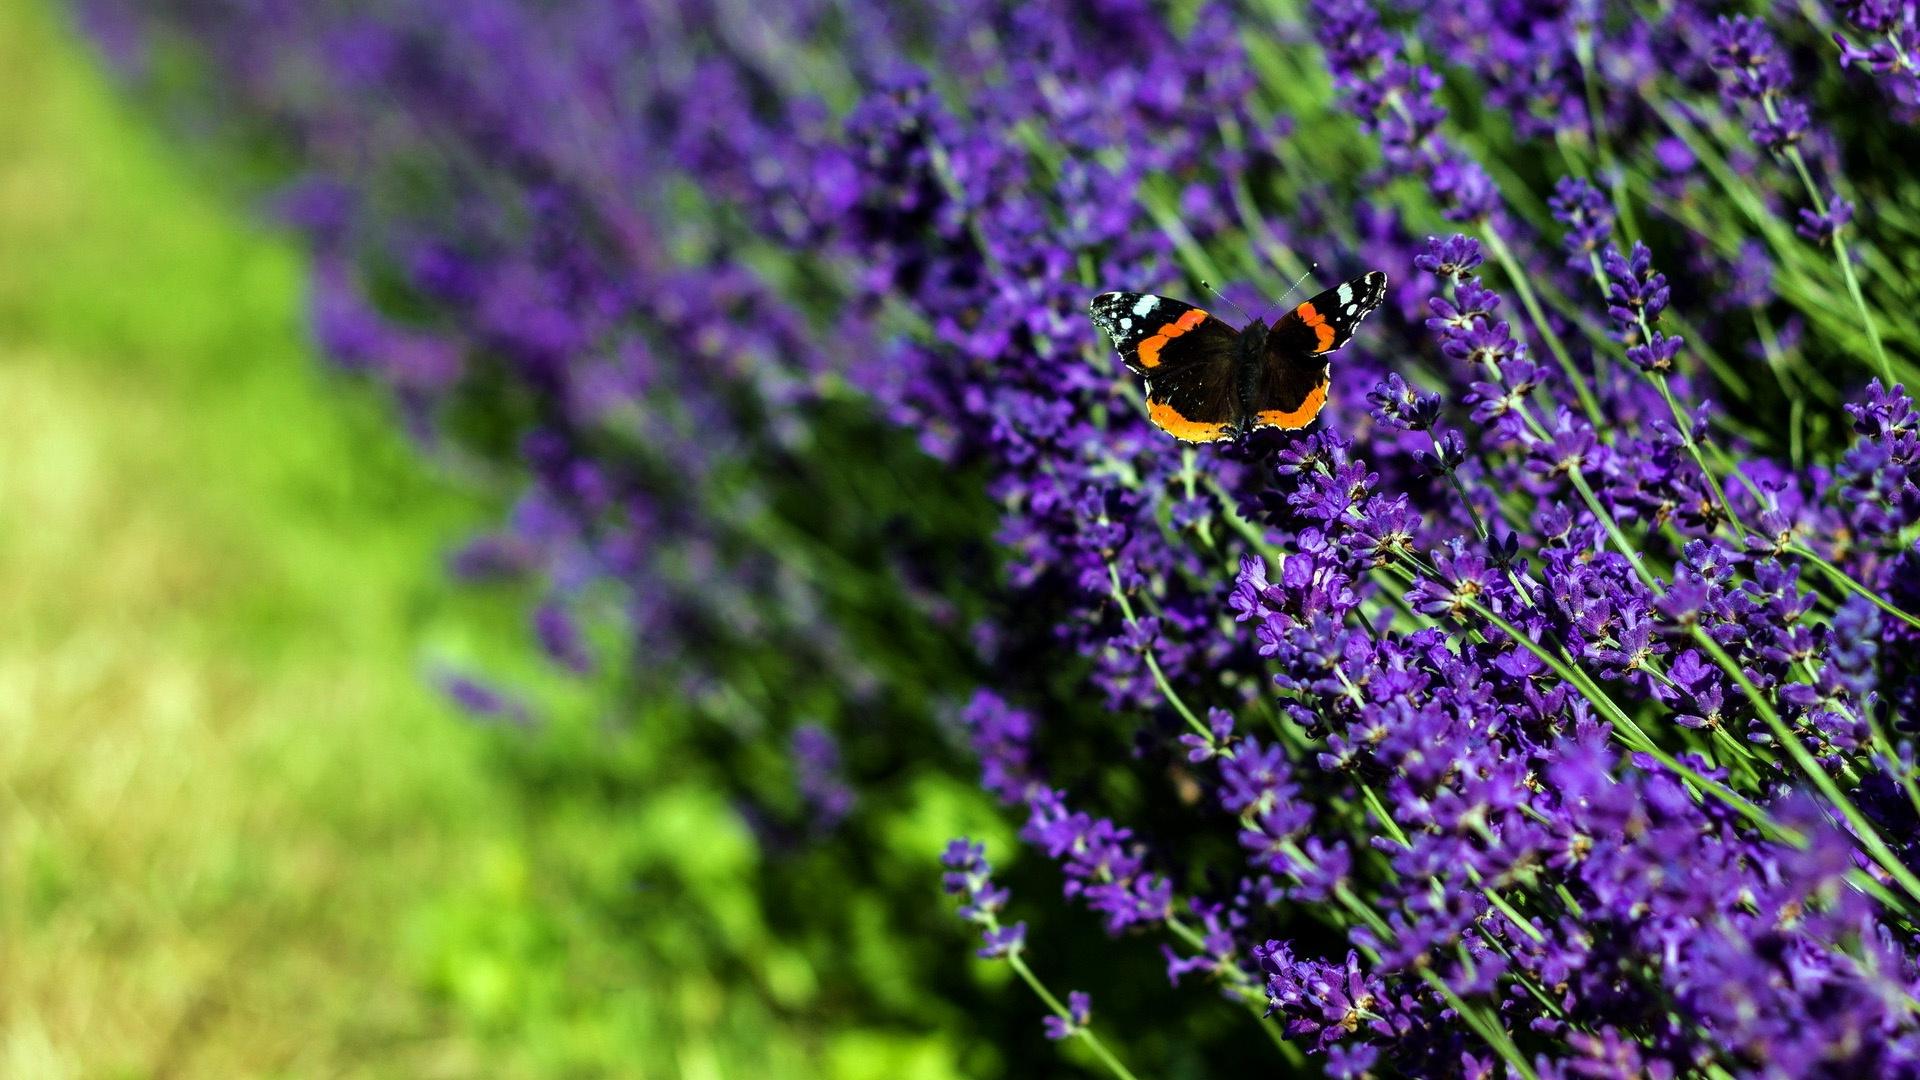 lavender wallpaper 1080p